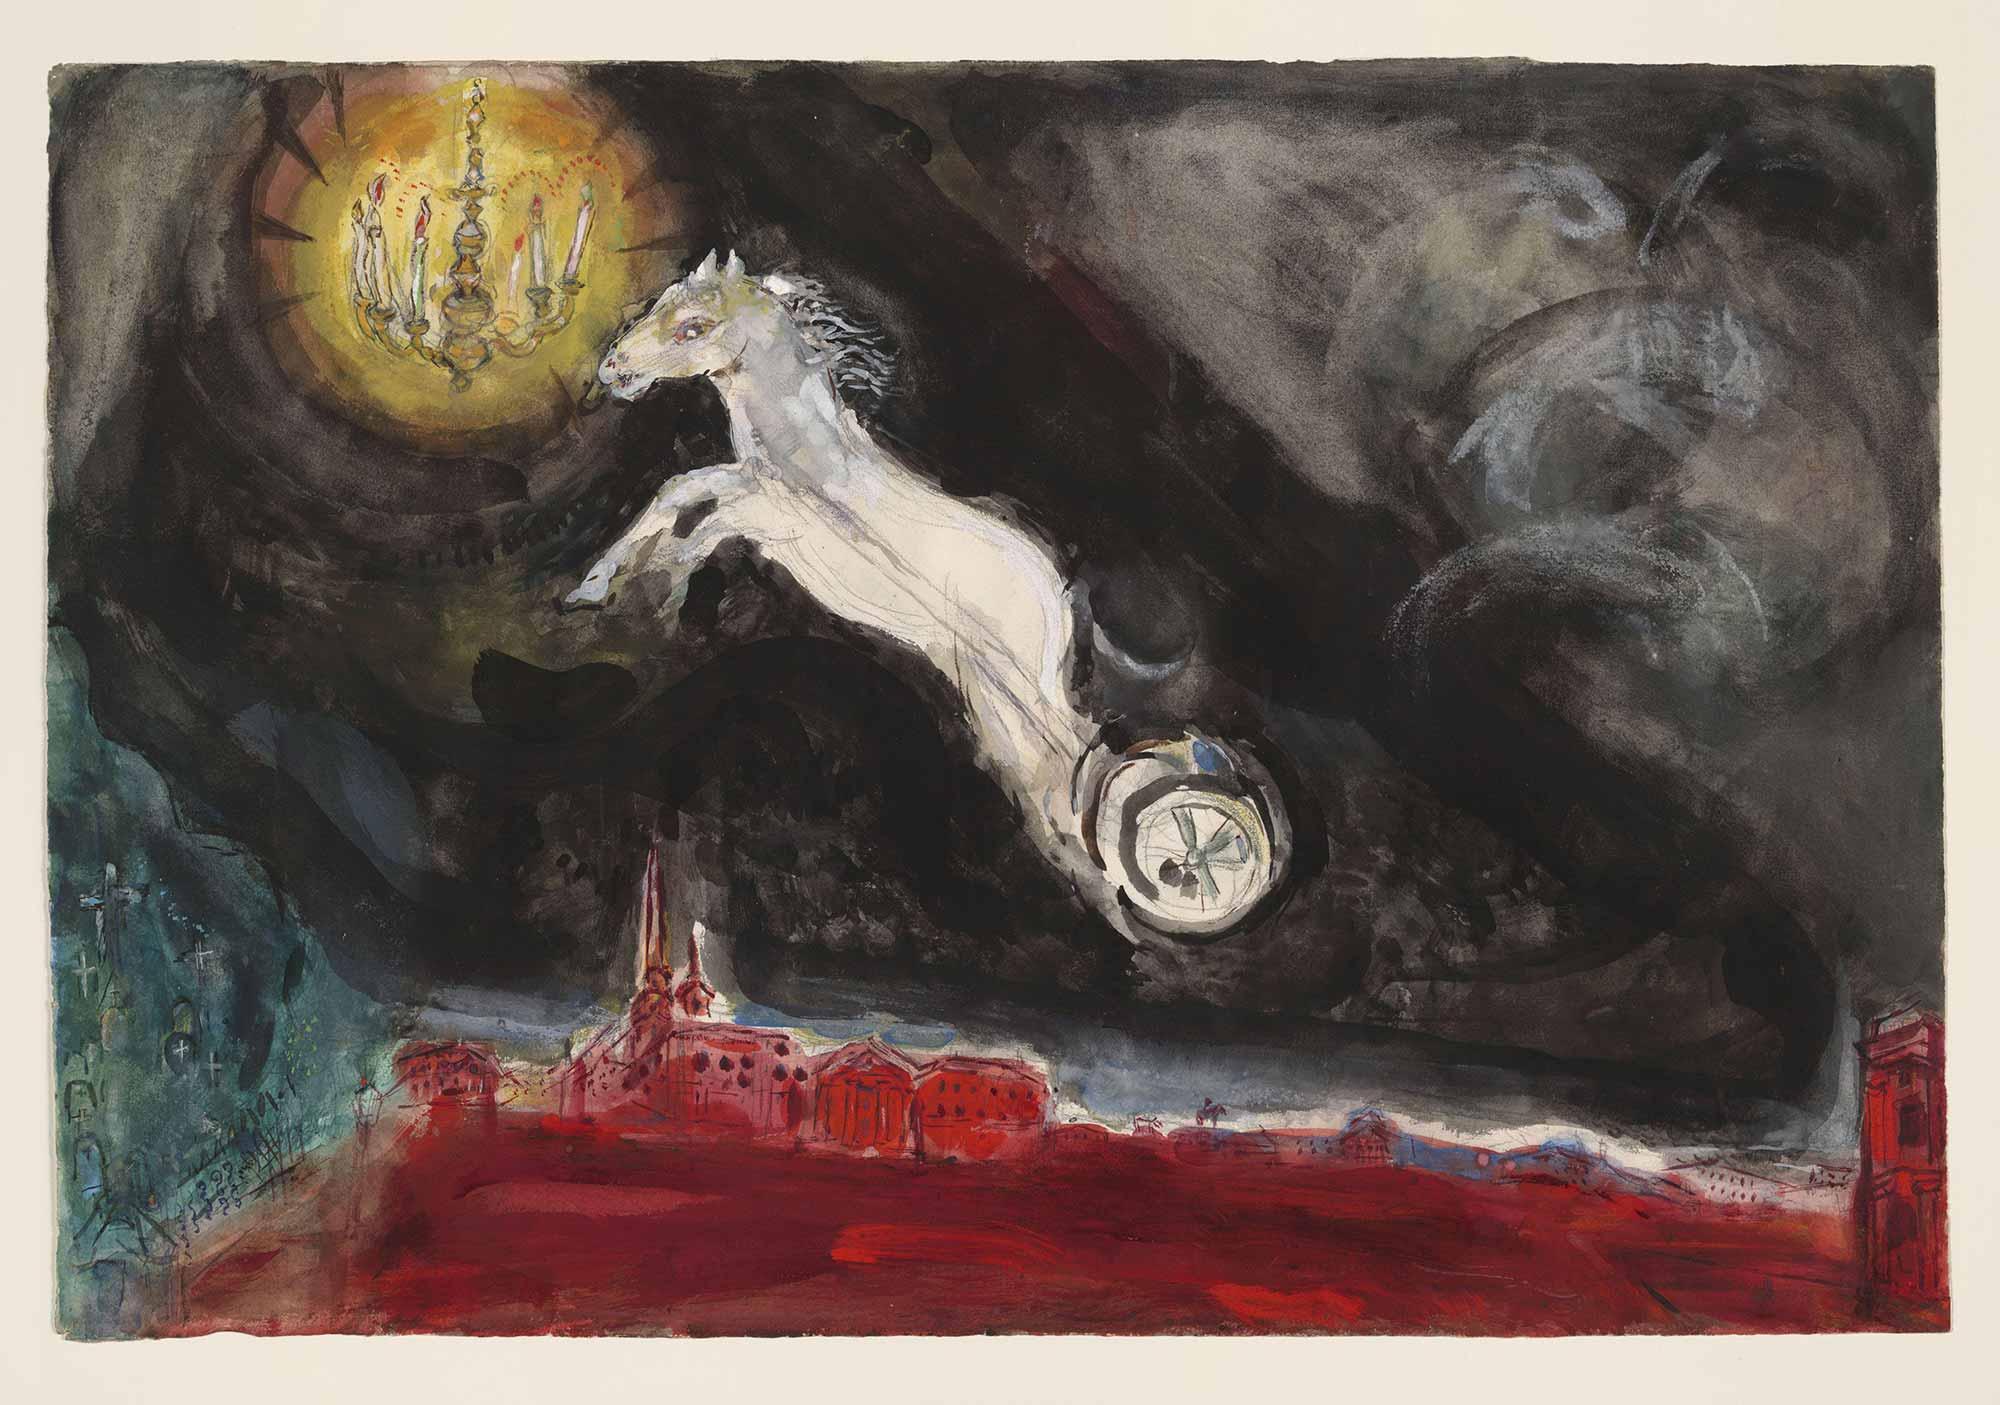 Marc Chagall St Petersburg Fantazisi